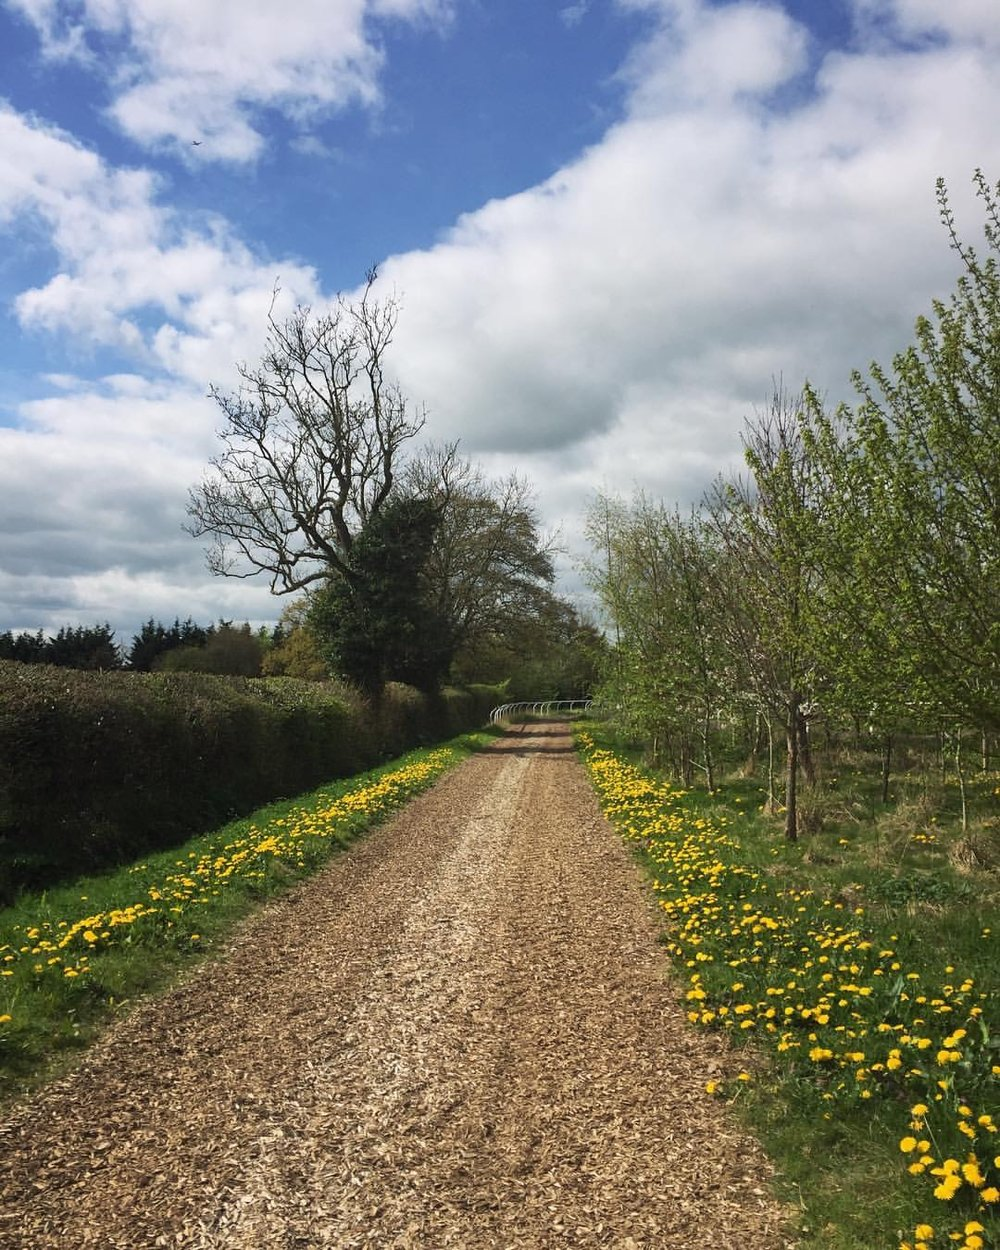 flowers and path.JPG